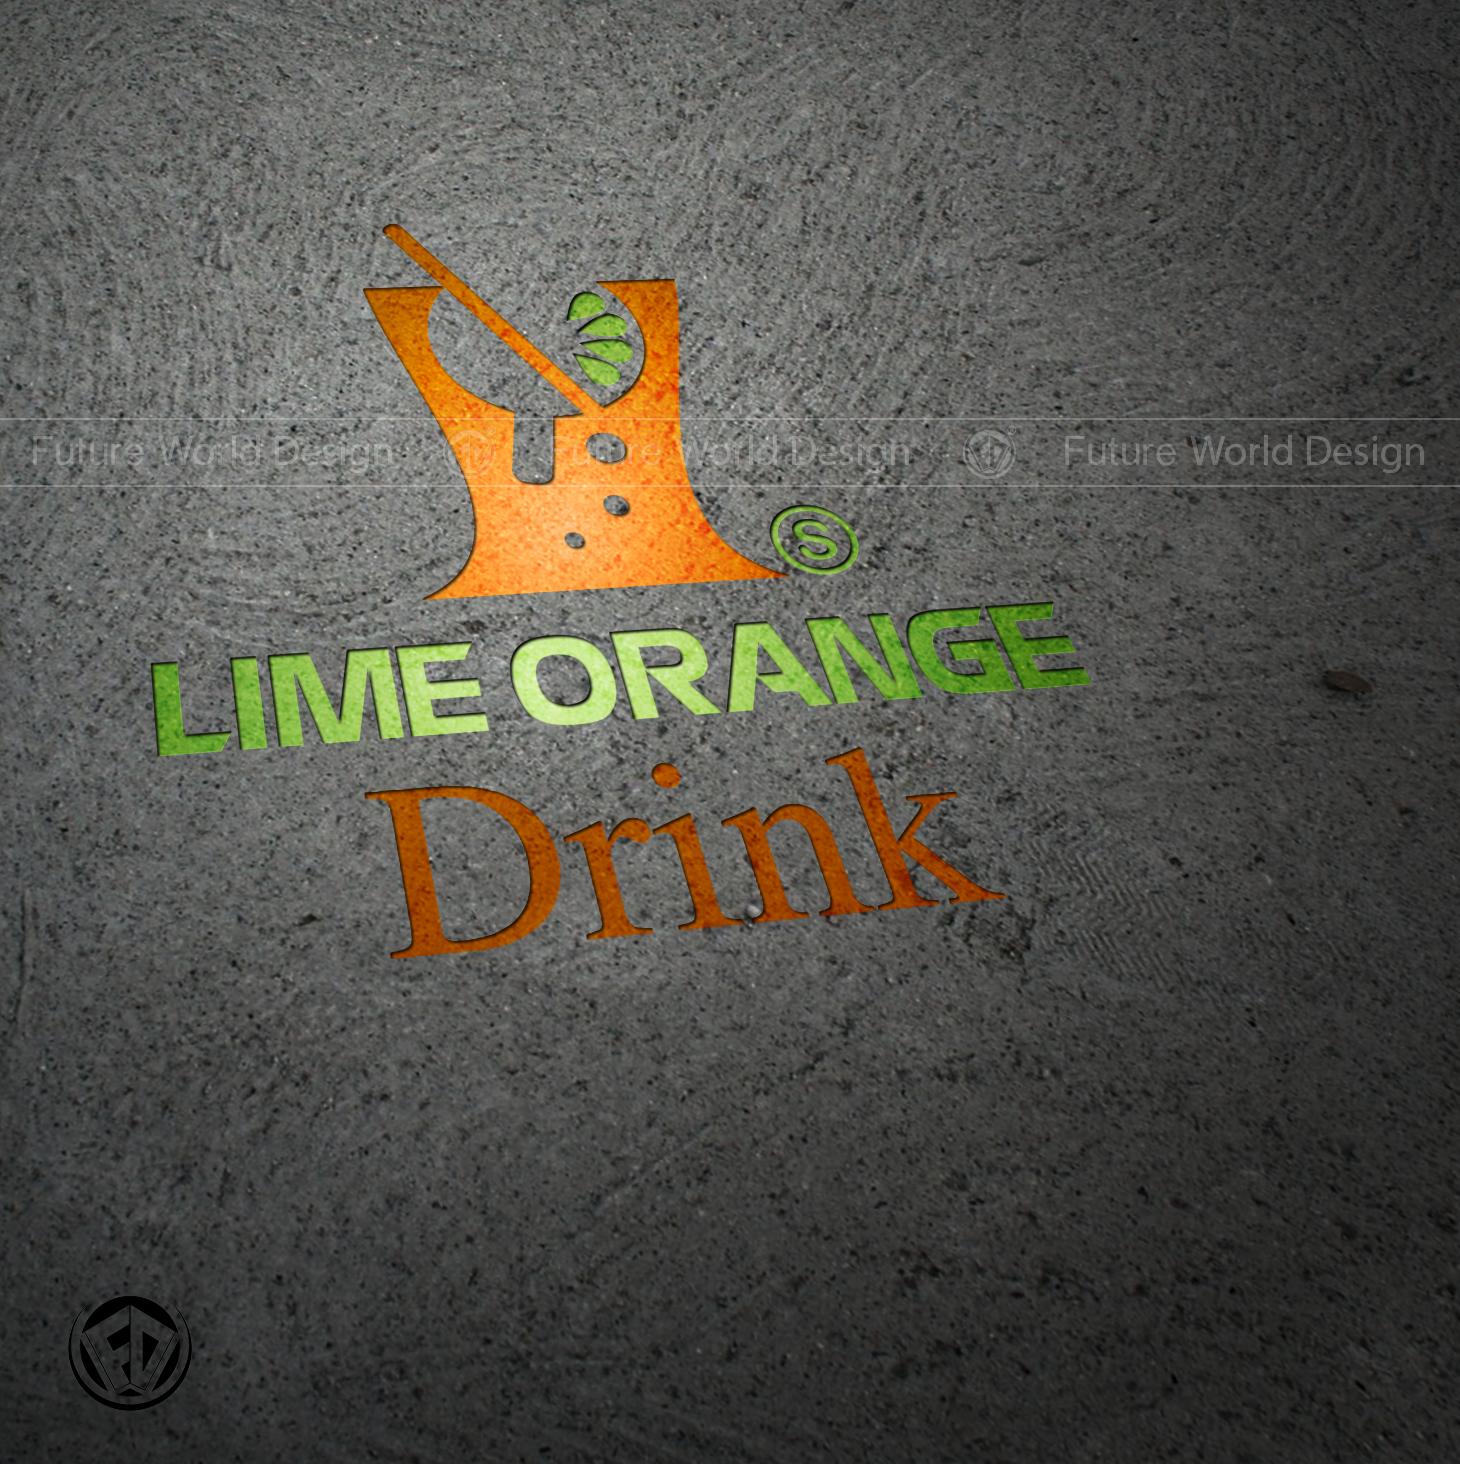 Lime Orange Drink - Logo Thiết Kế Online Toàn Quốc